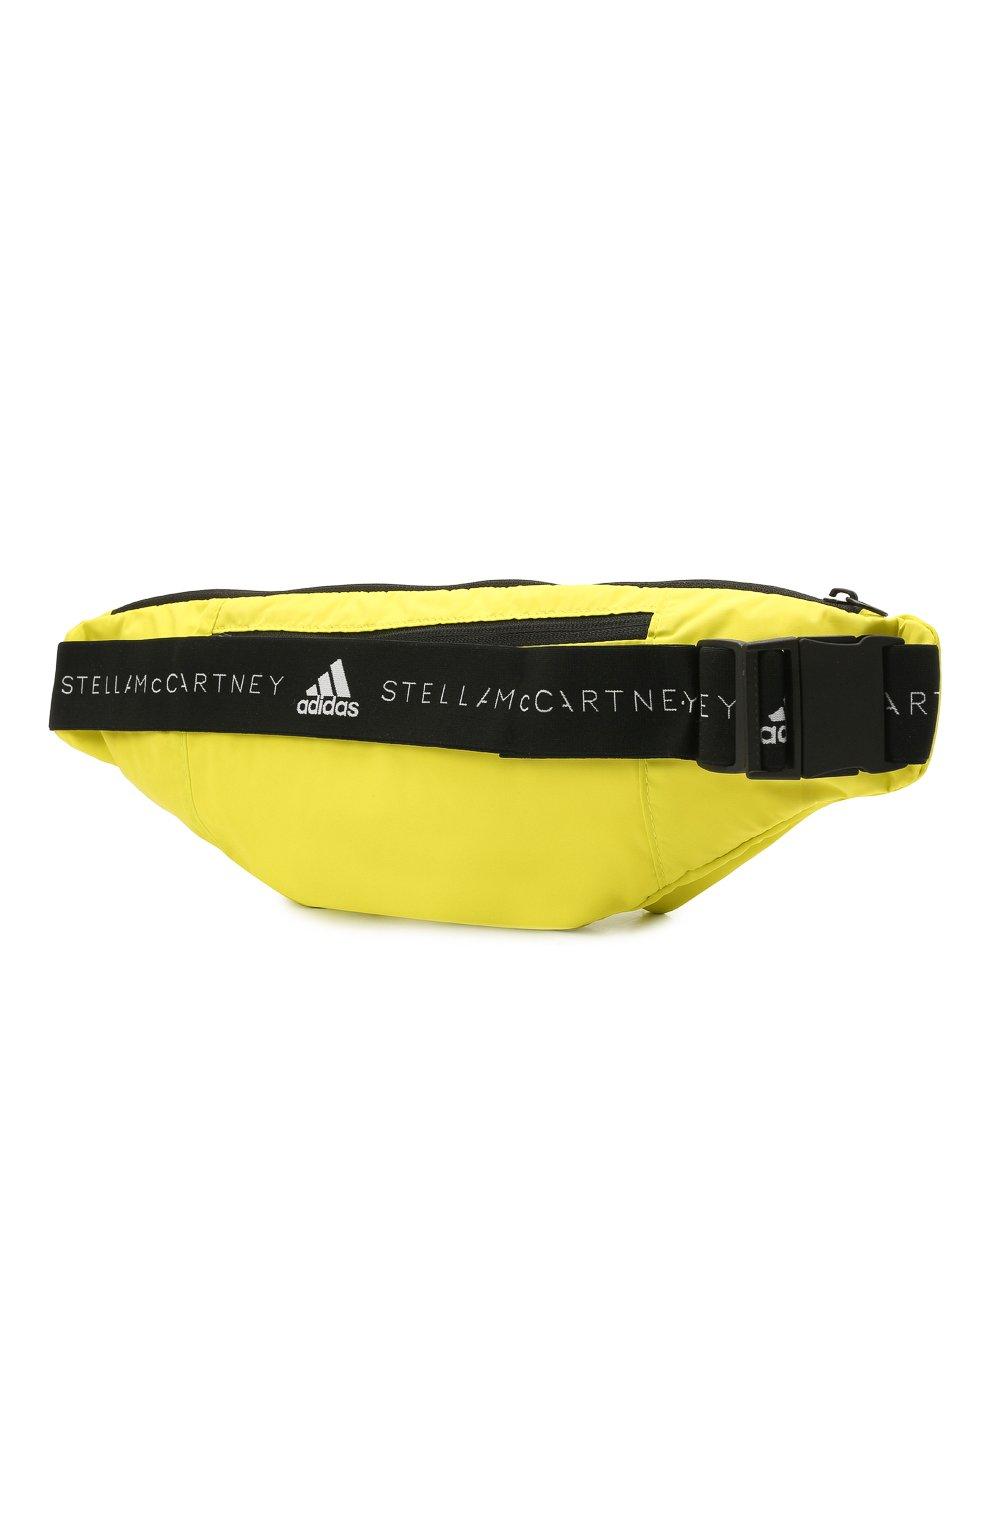 Женская поясная сумка ADIDAS BY STELLA MCCARTNEY желтого цвета, арт. GQ0550 | Фото 3